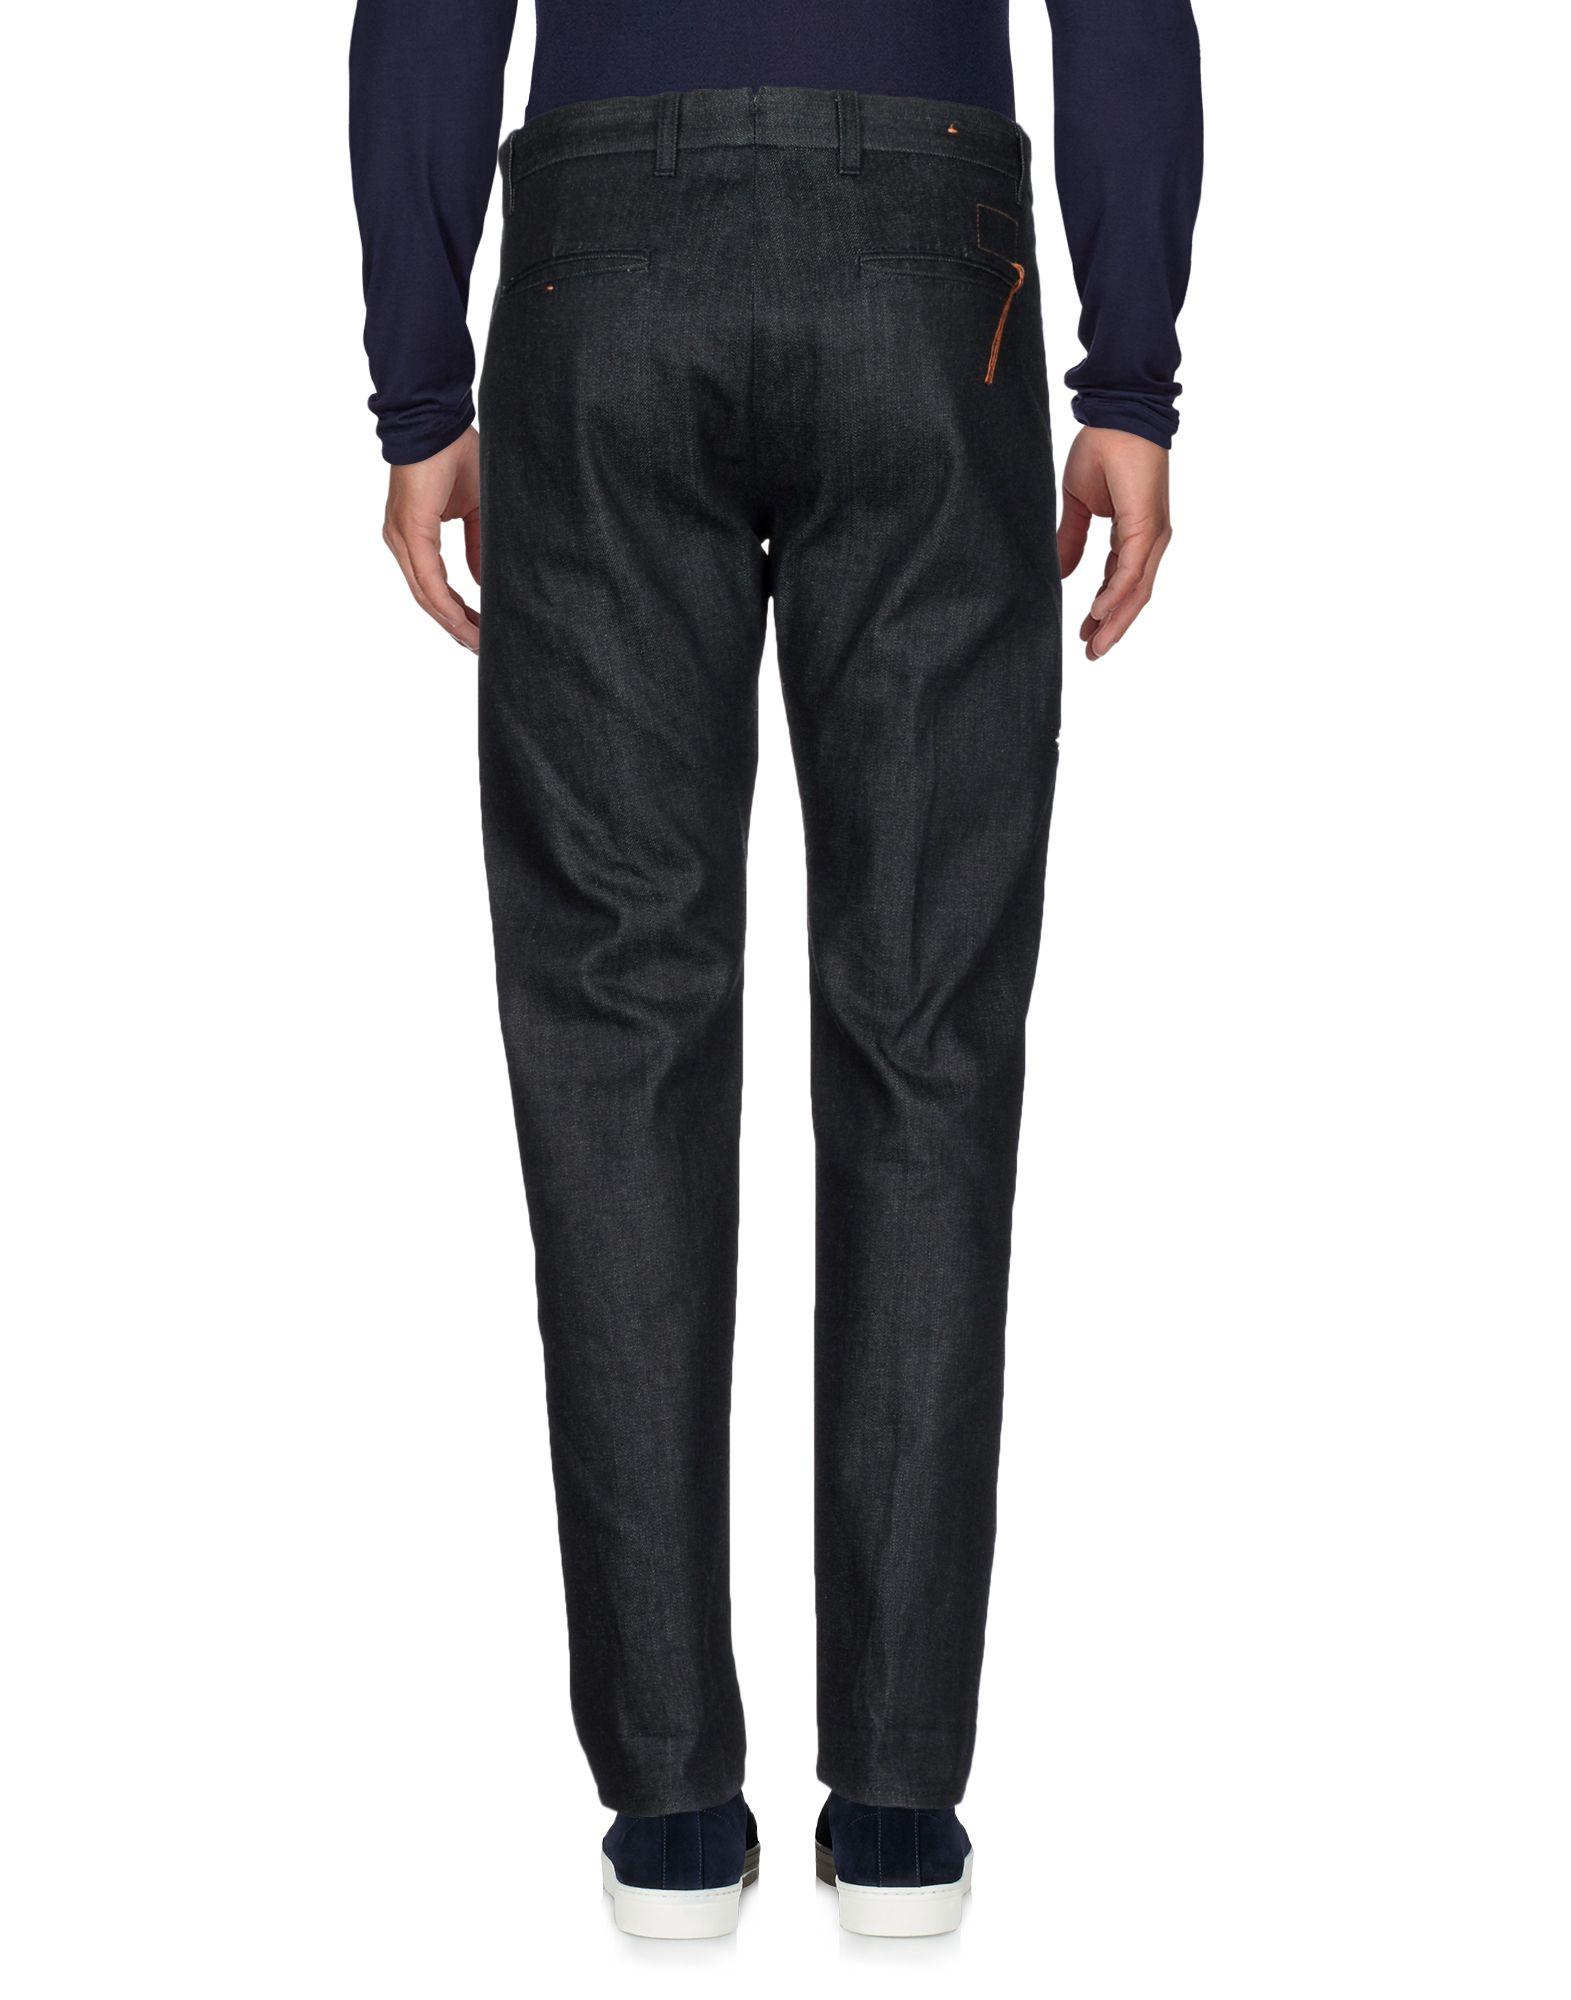 Pantaloni Jeans Fortela Fortela Fortela Uomo - 42670080PN 84cc80